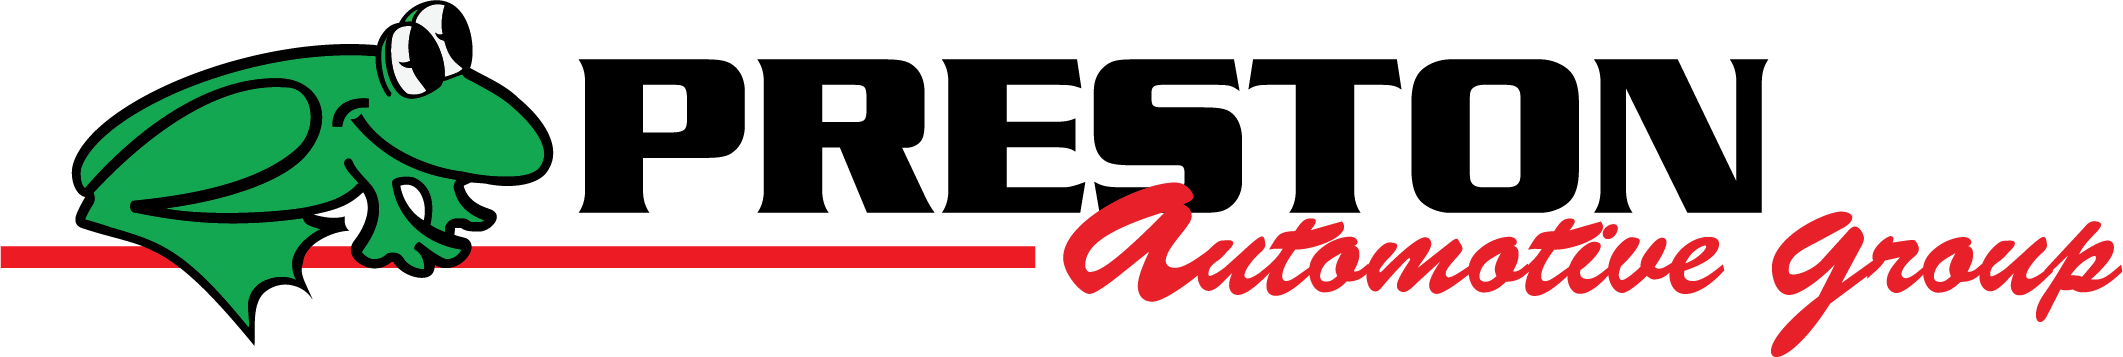 Preston Automotive Group